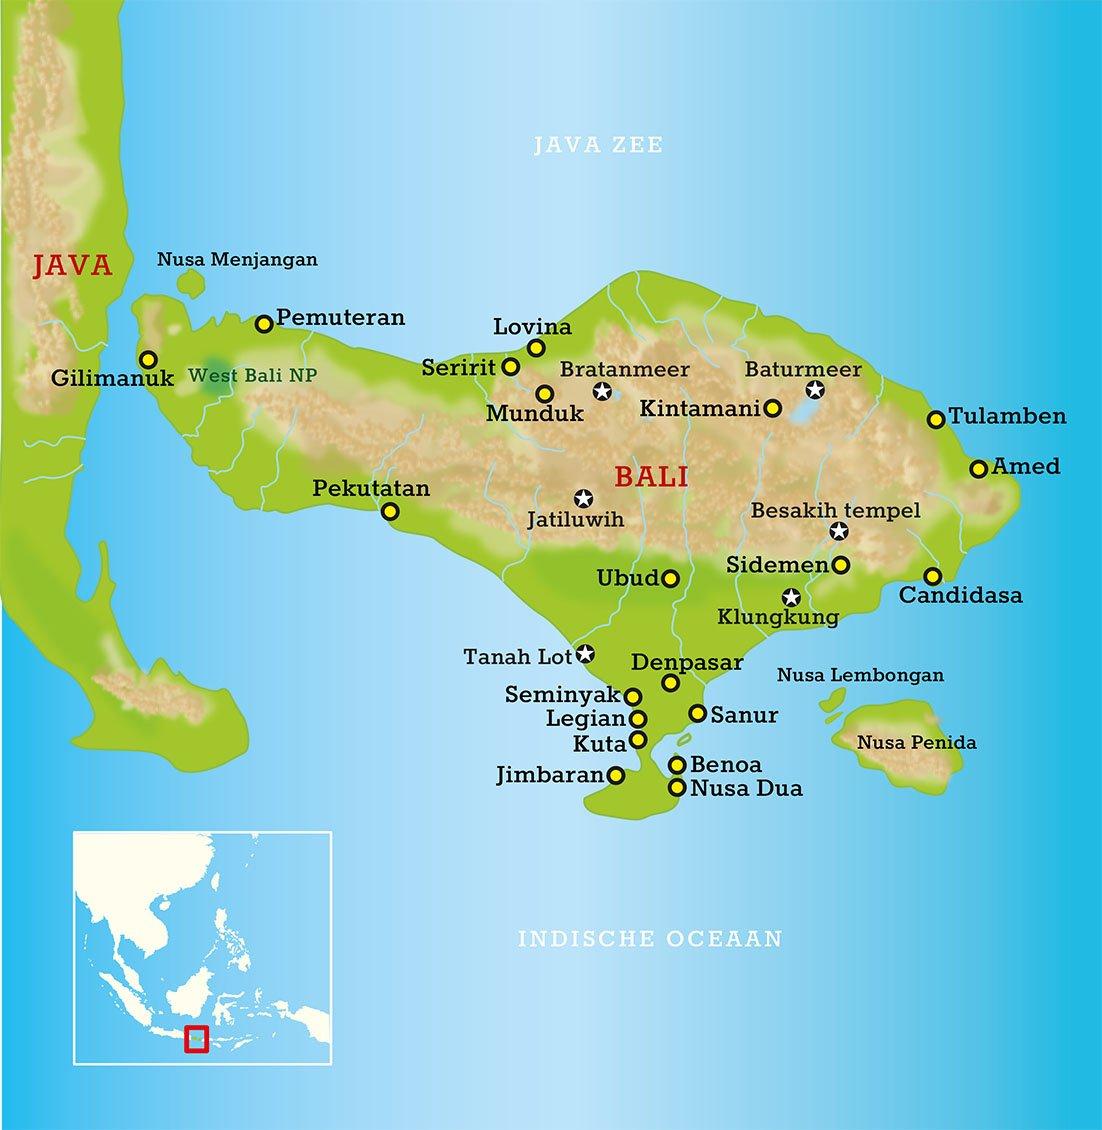 Bali eilandkaart 1102-1130.jpg